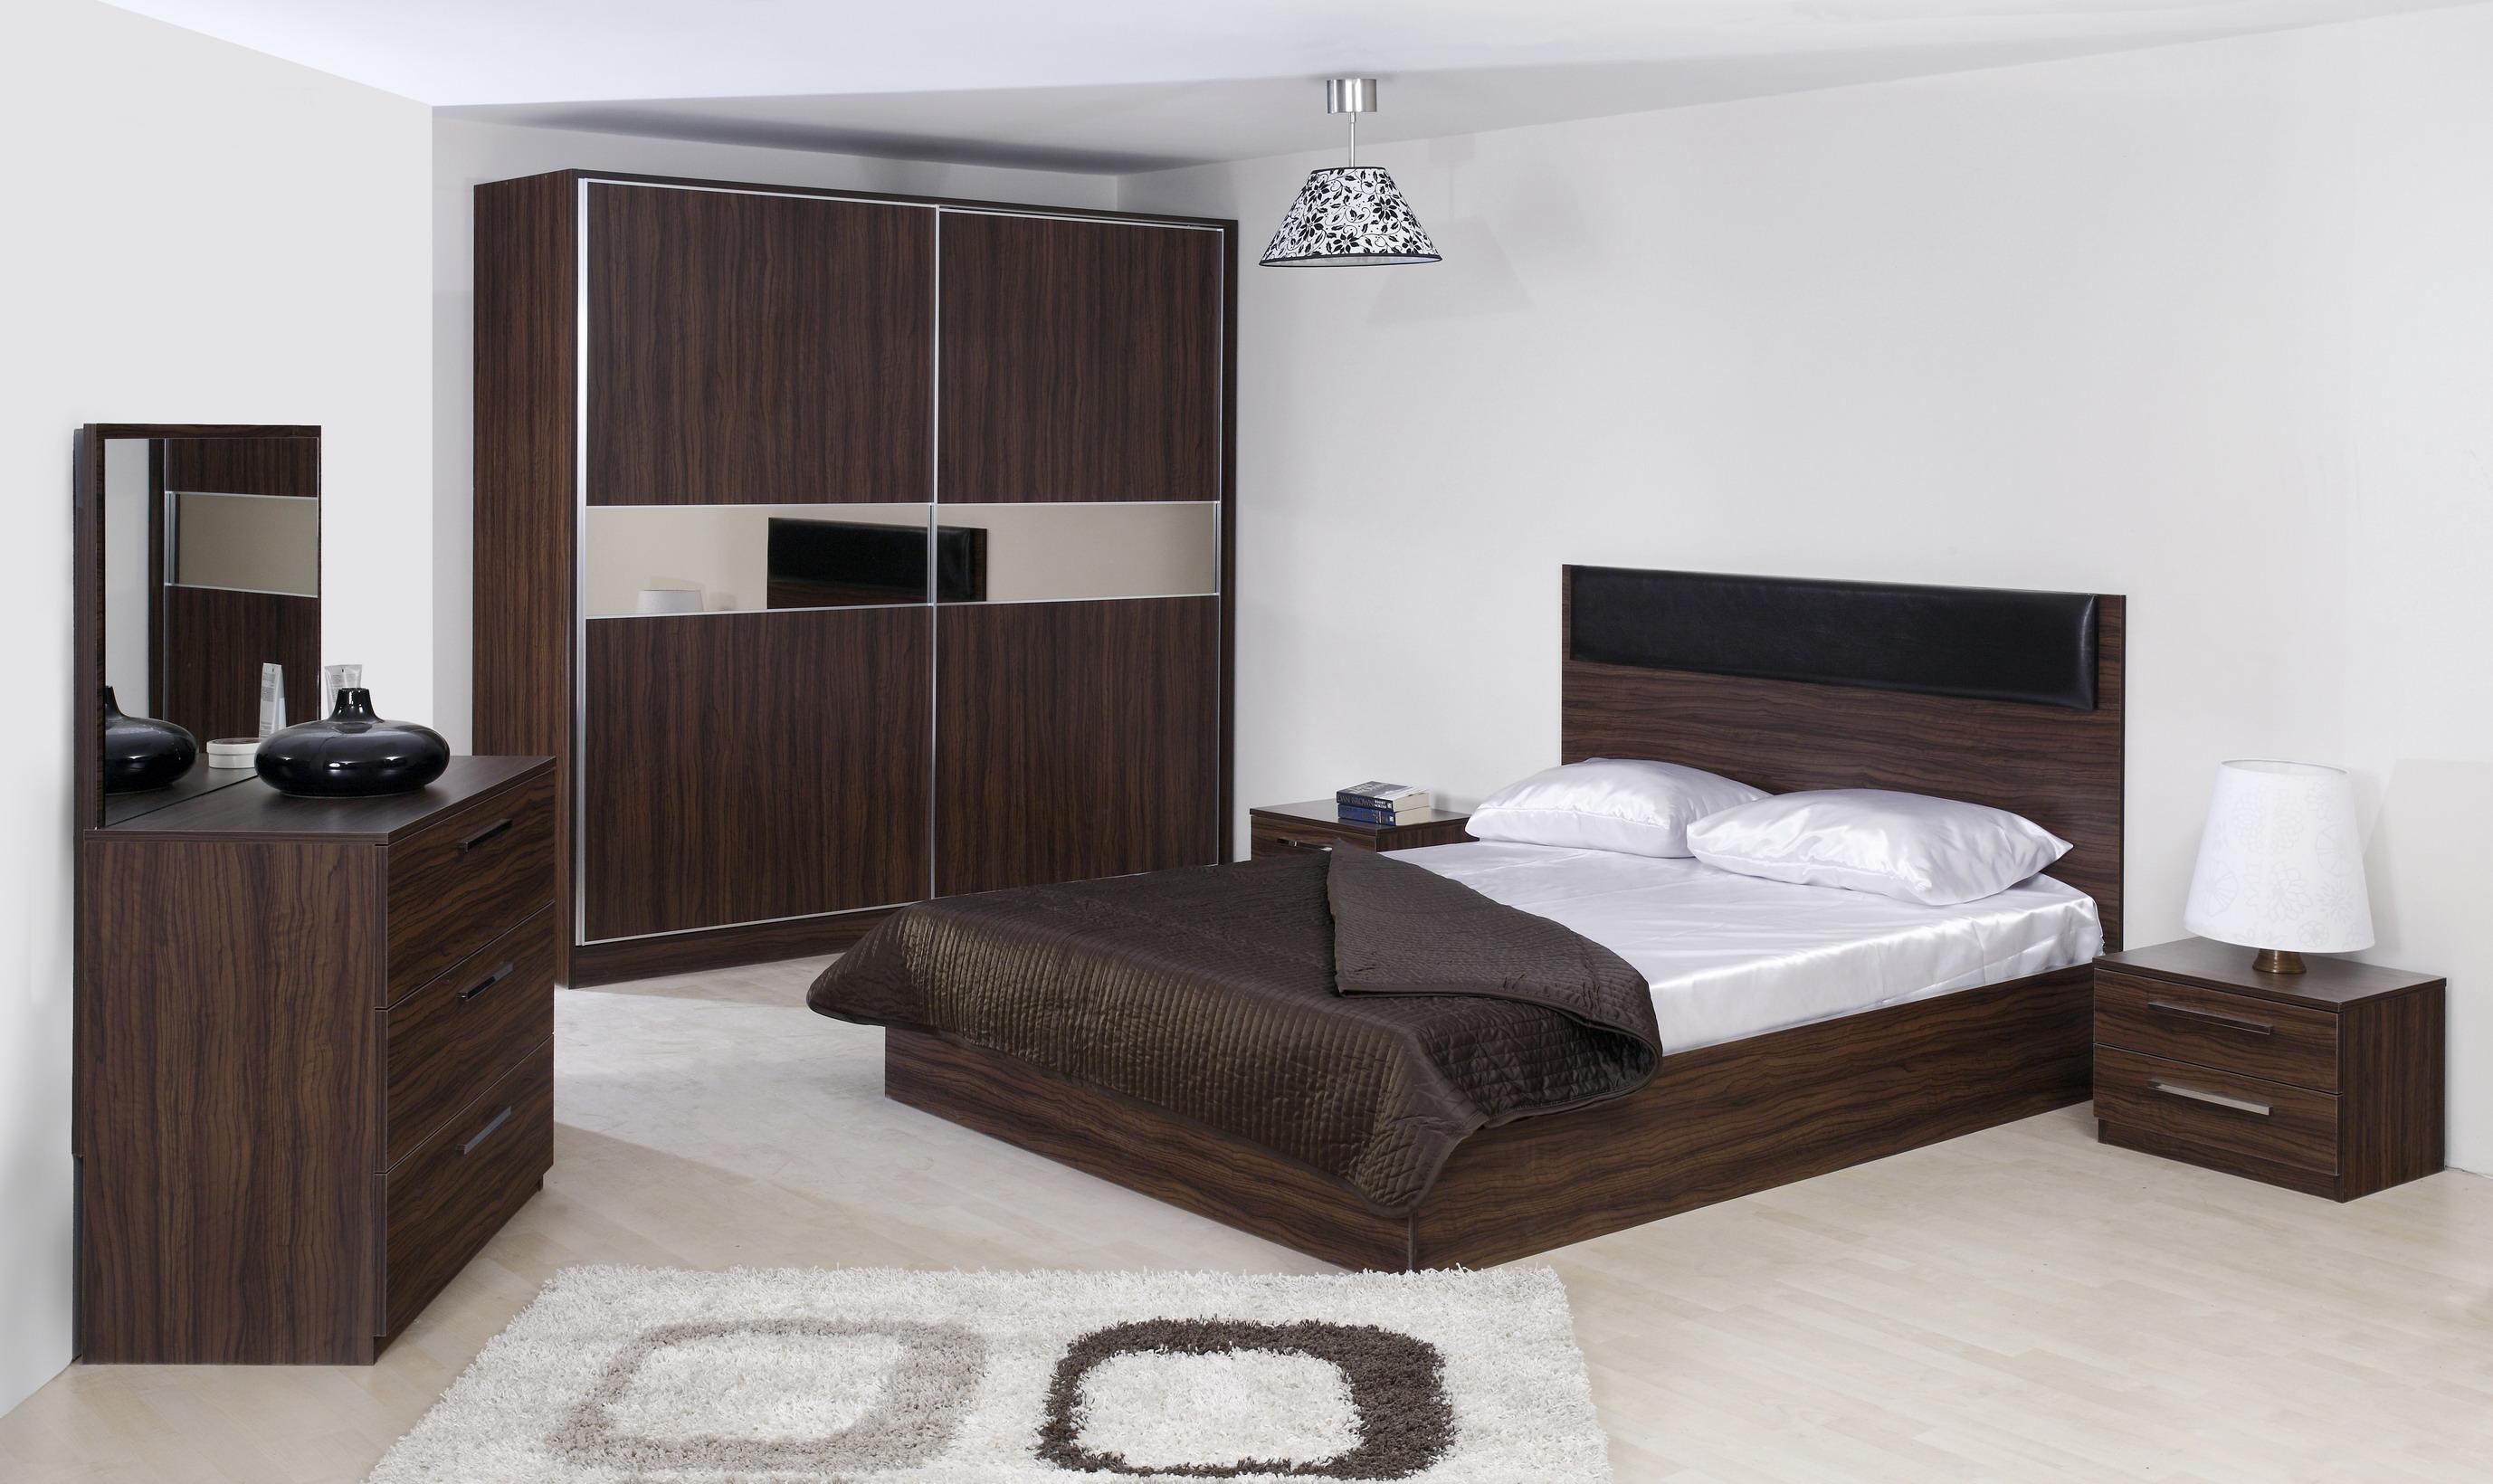 En Ucuz Yatak Odasi Takimlari Fiyatlari